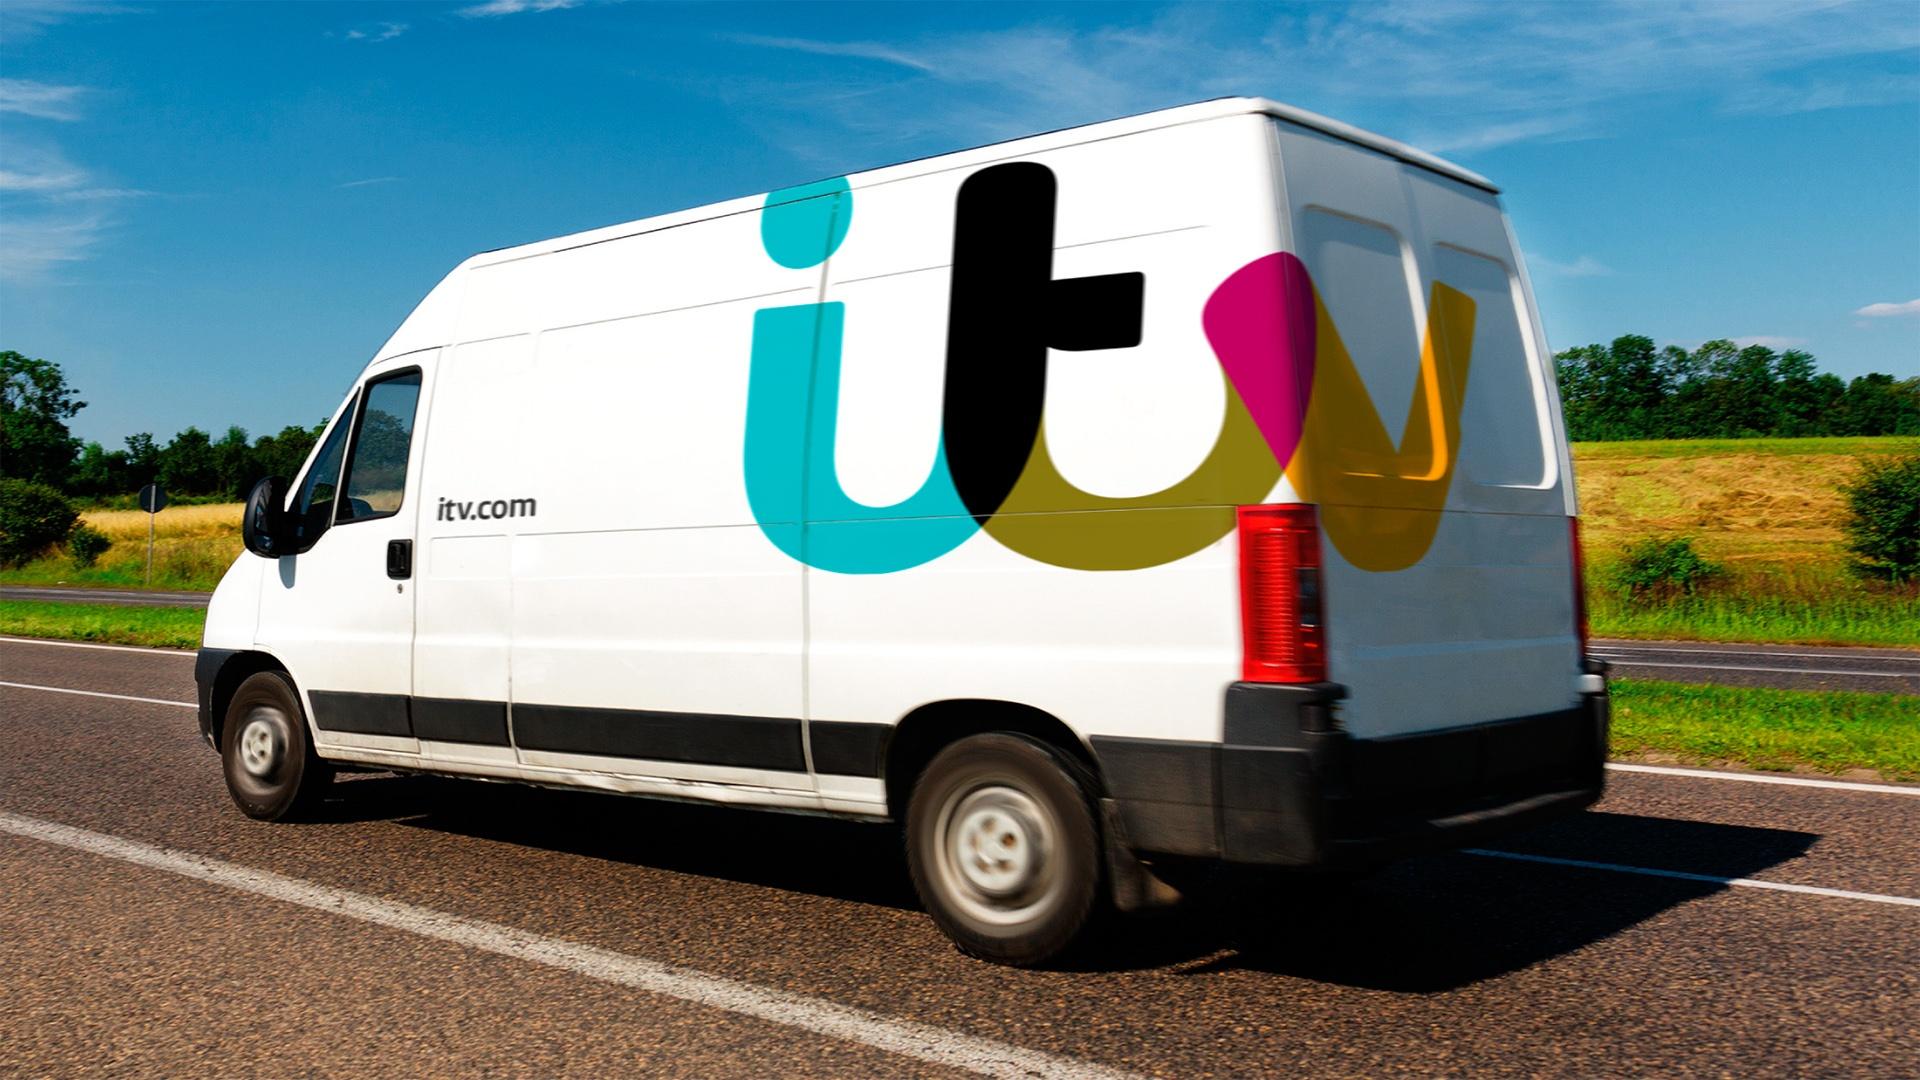 Brand Design_ITV_Rudd Studio_4.jpg